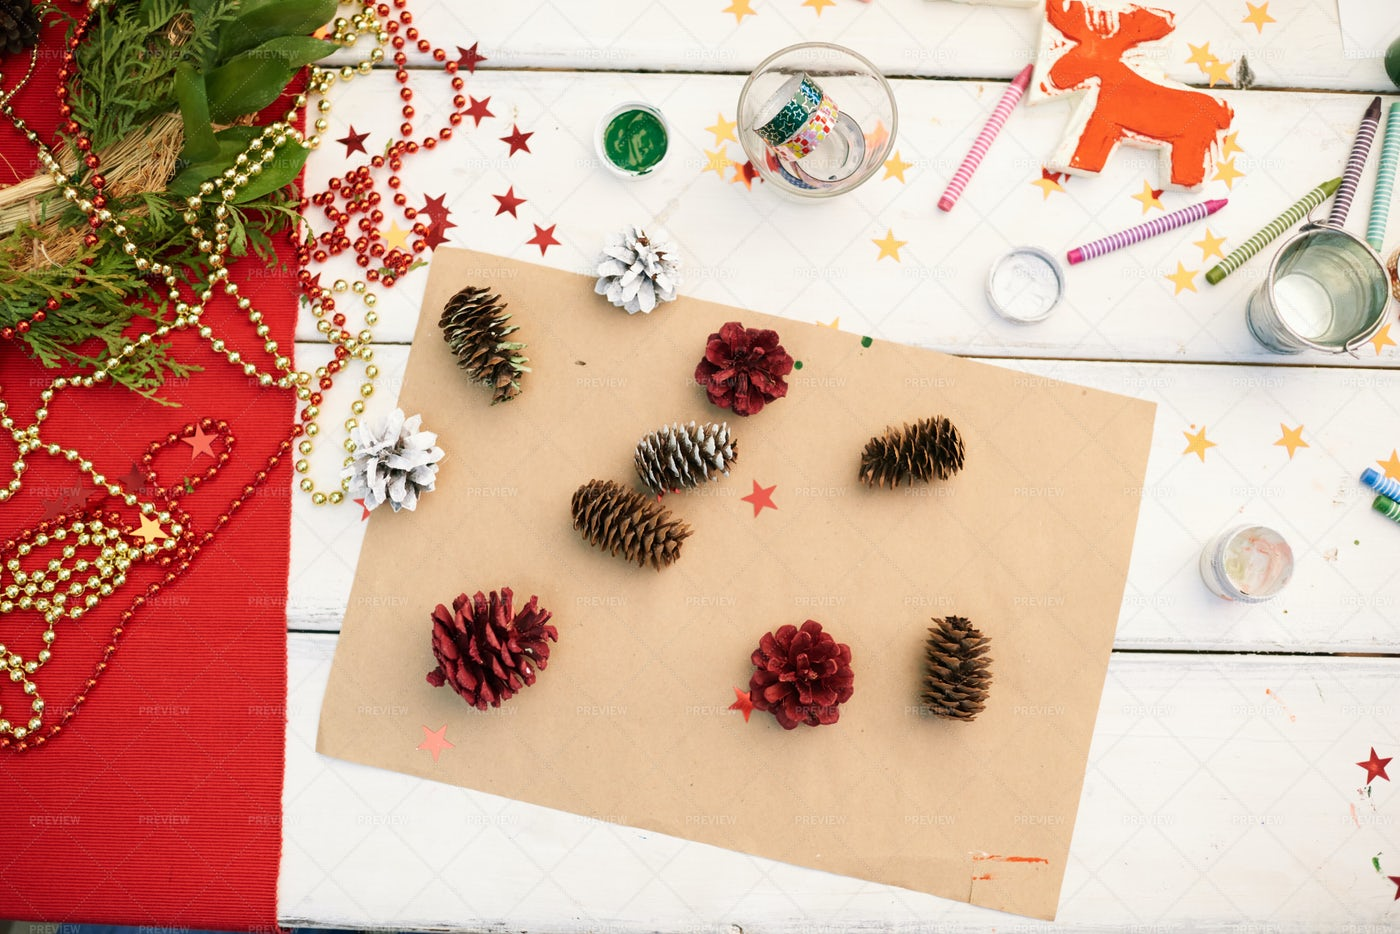 Pleasant Preparations Of Christmas...: Stock Photos